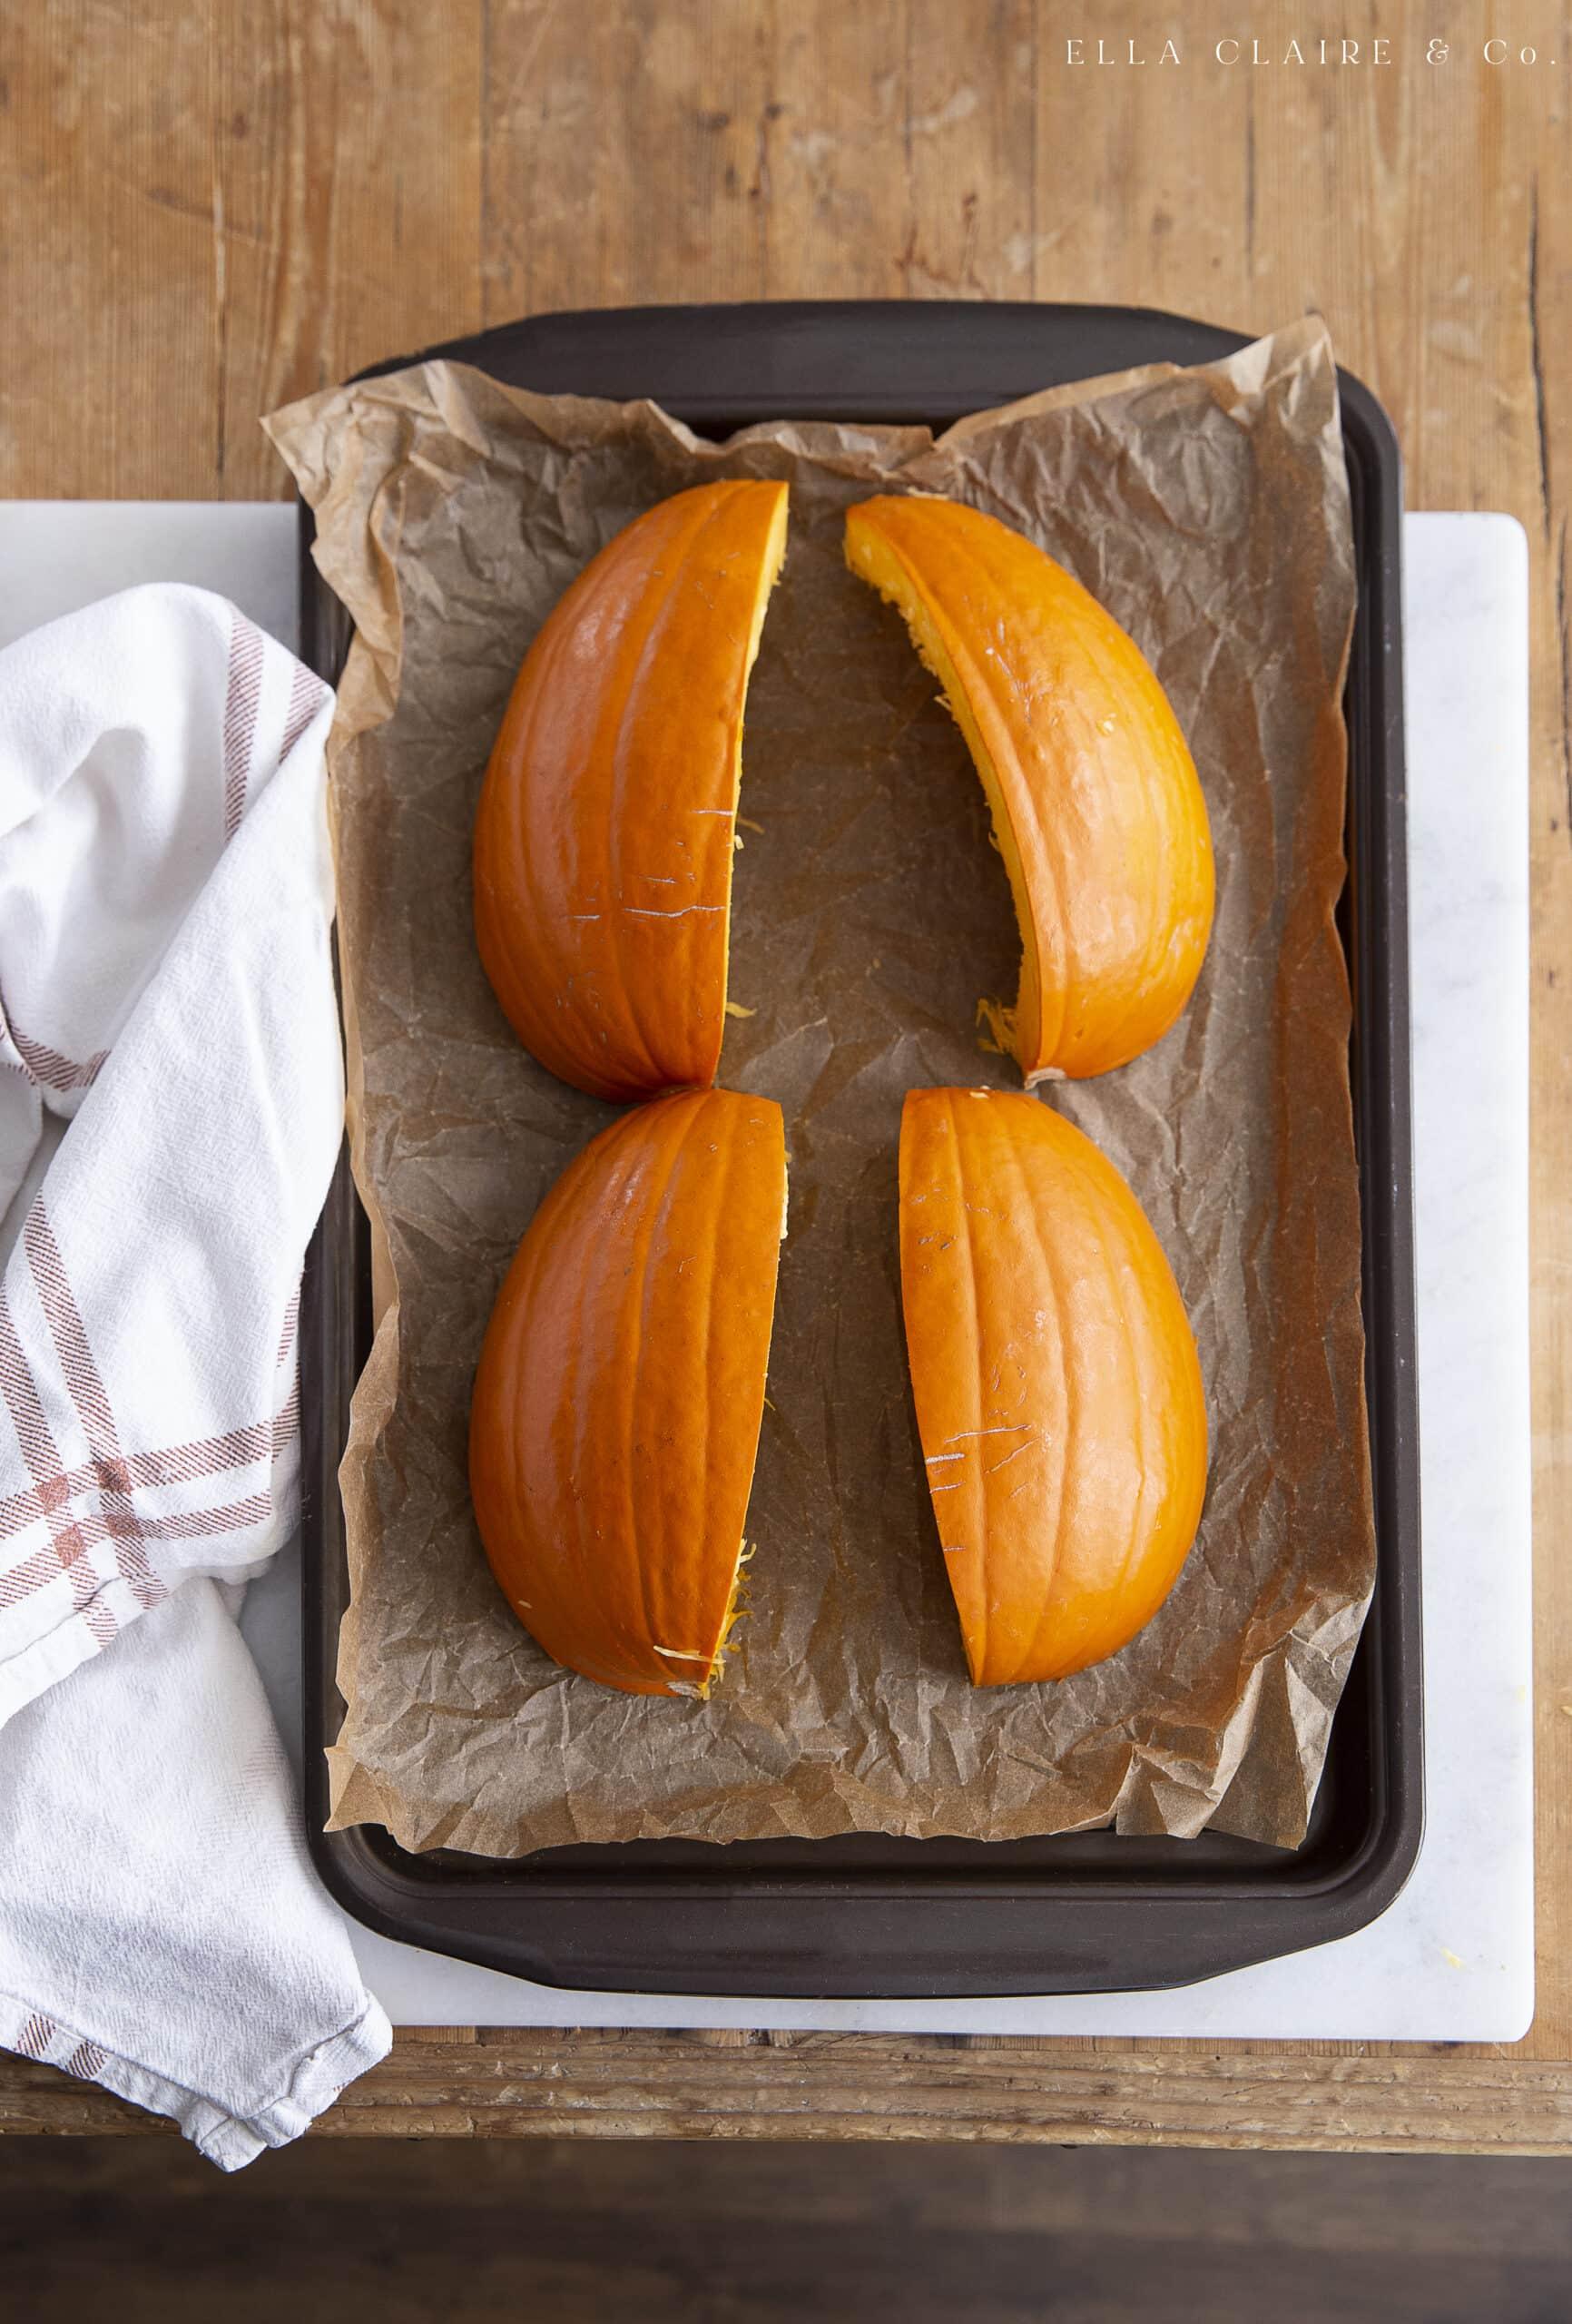 sliced pumpkin ready to bake